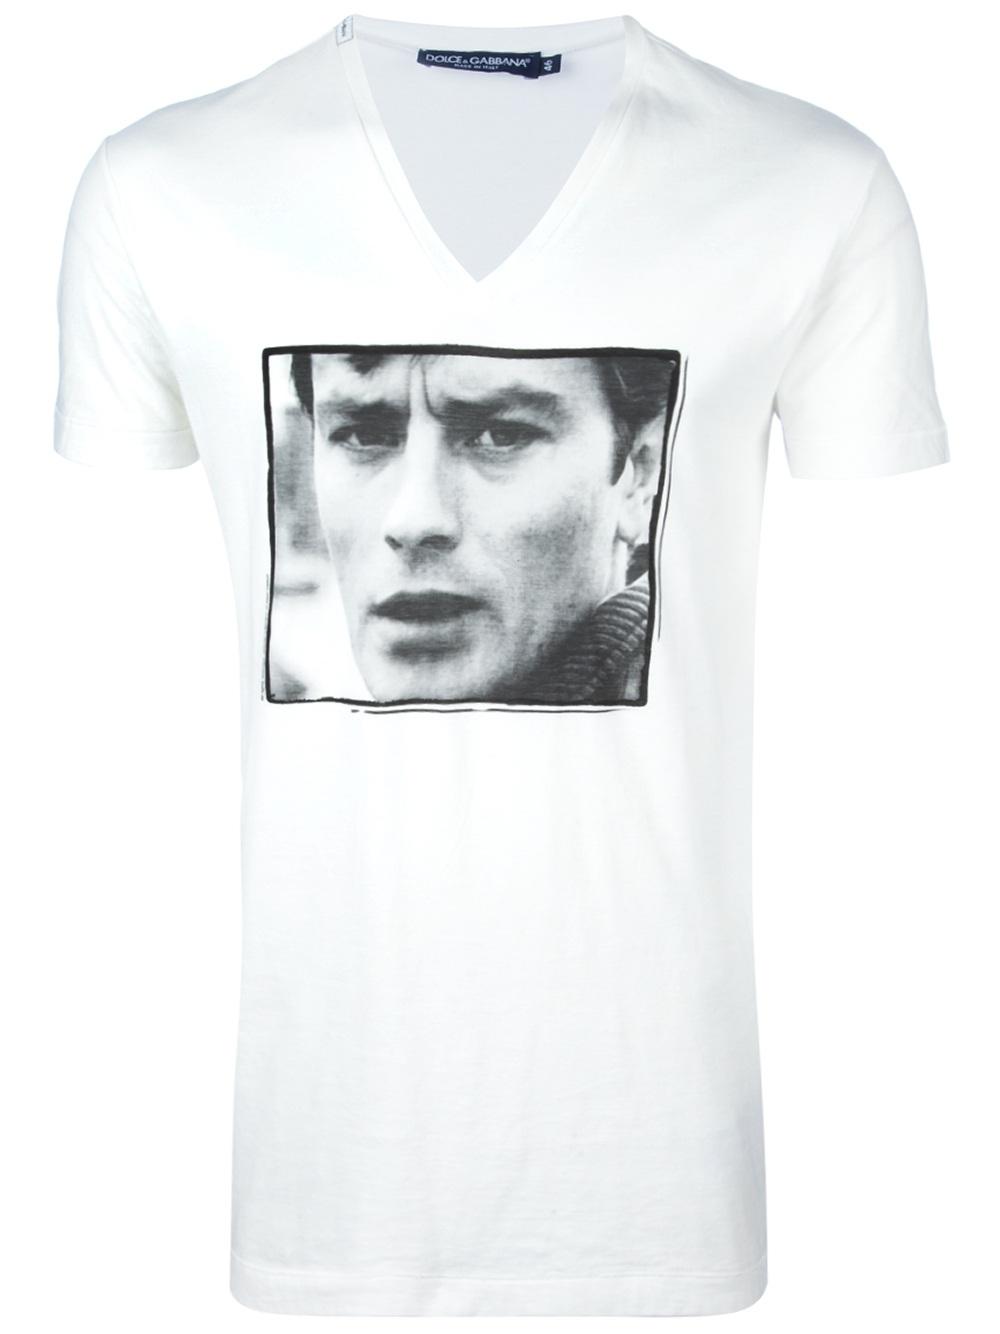 ec79ed0efe1a81 Lyst - Dolce   Gabbana Alain Delon Tshirt in White for Men